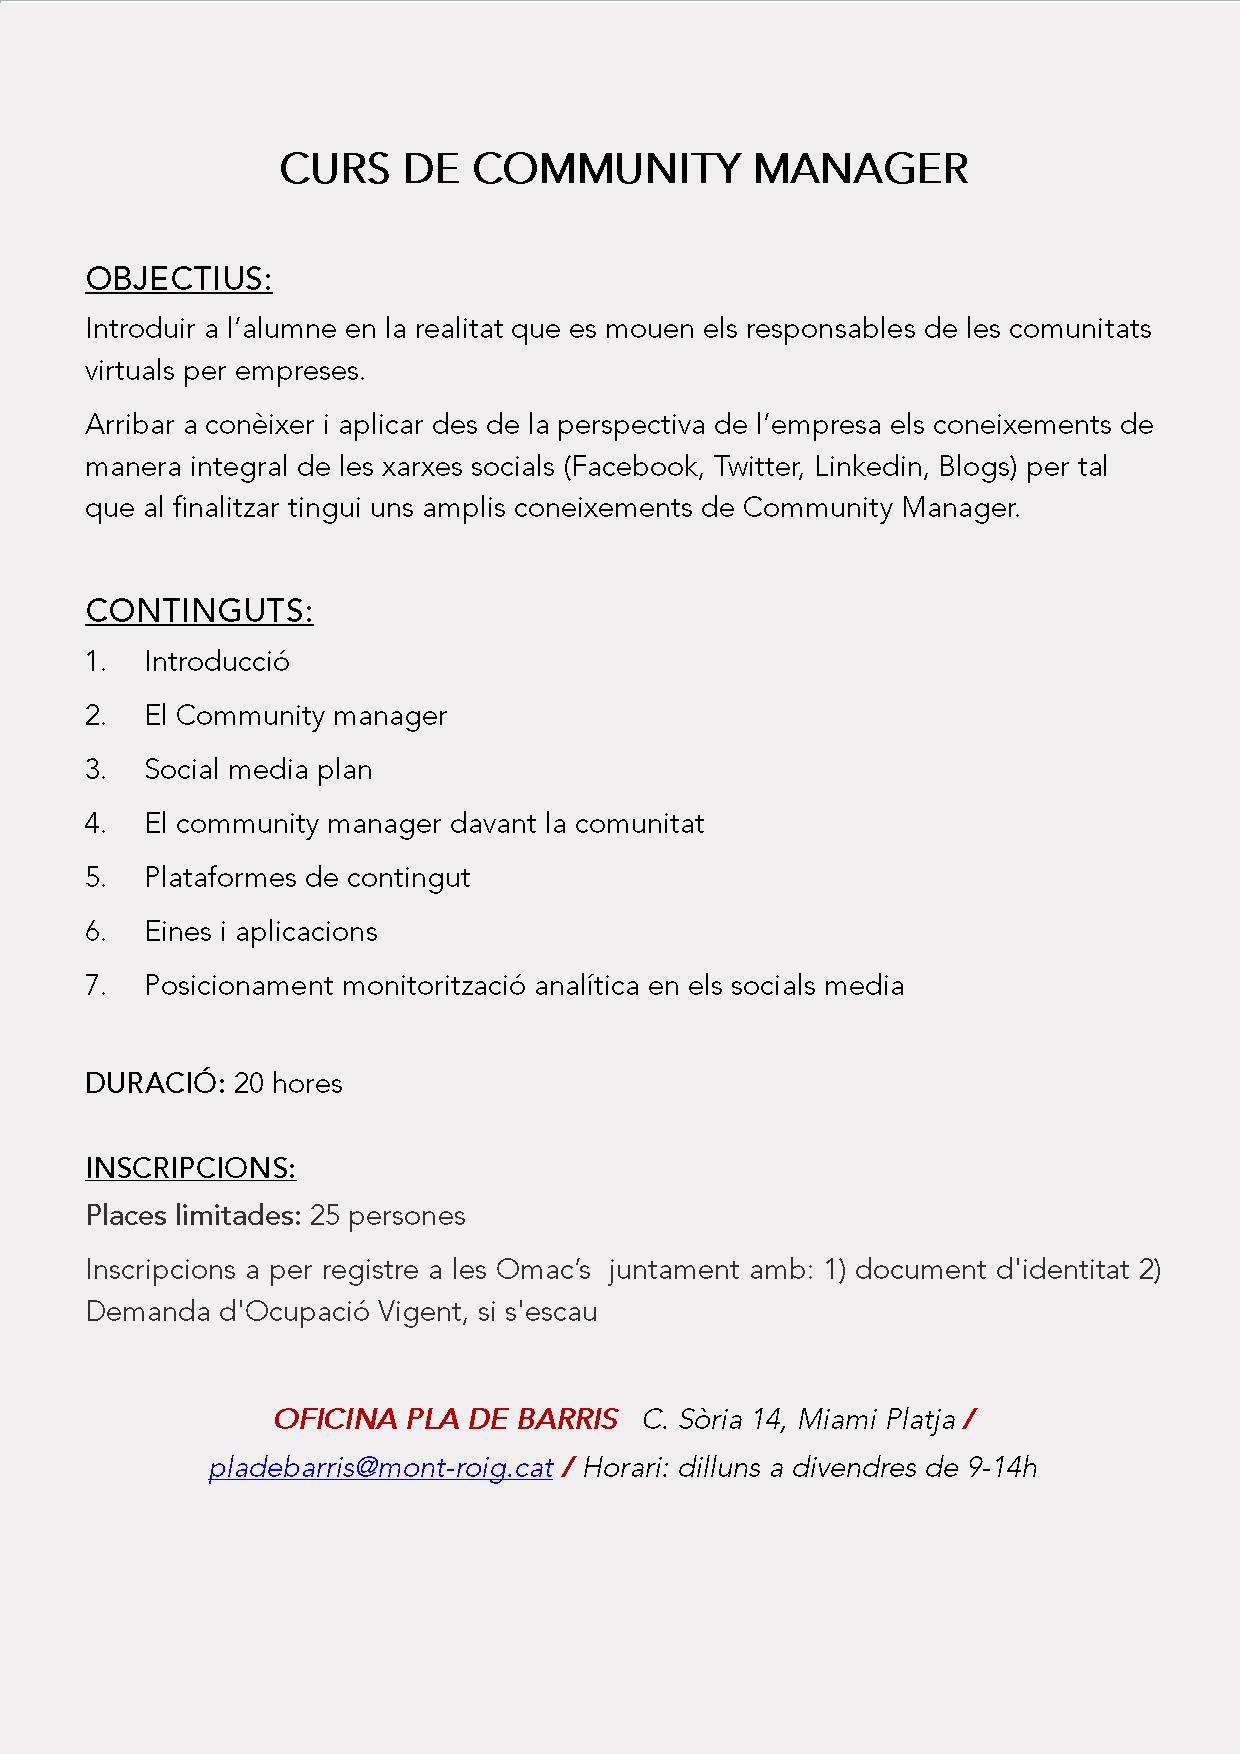 cartell-community_2